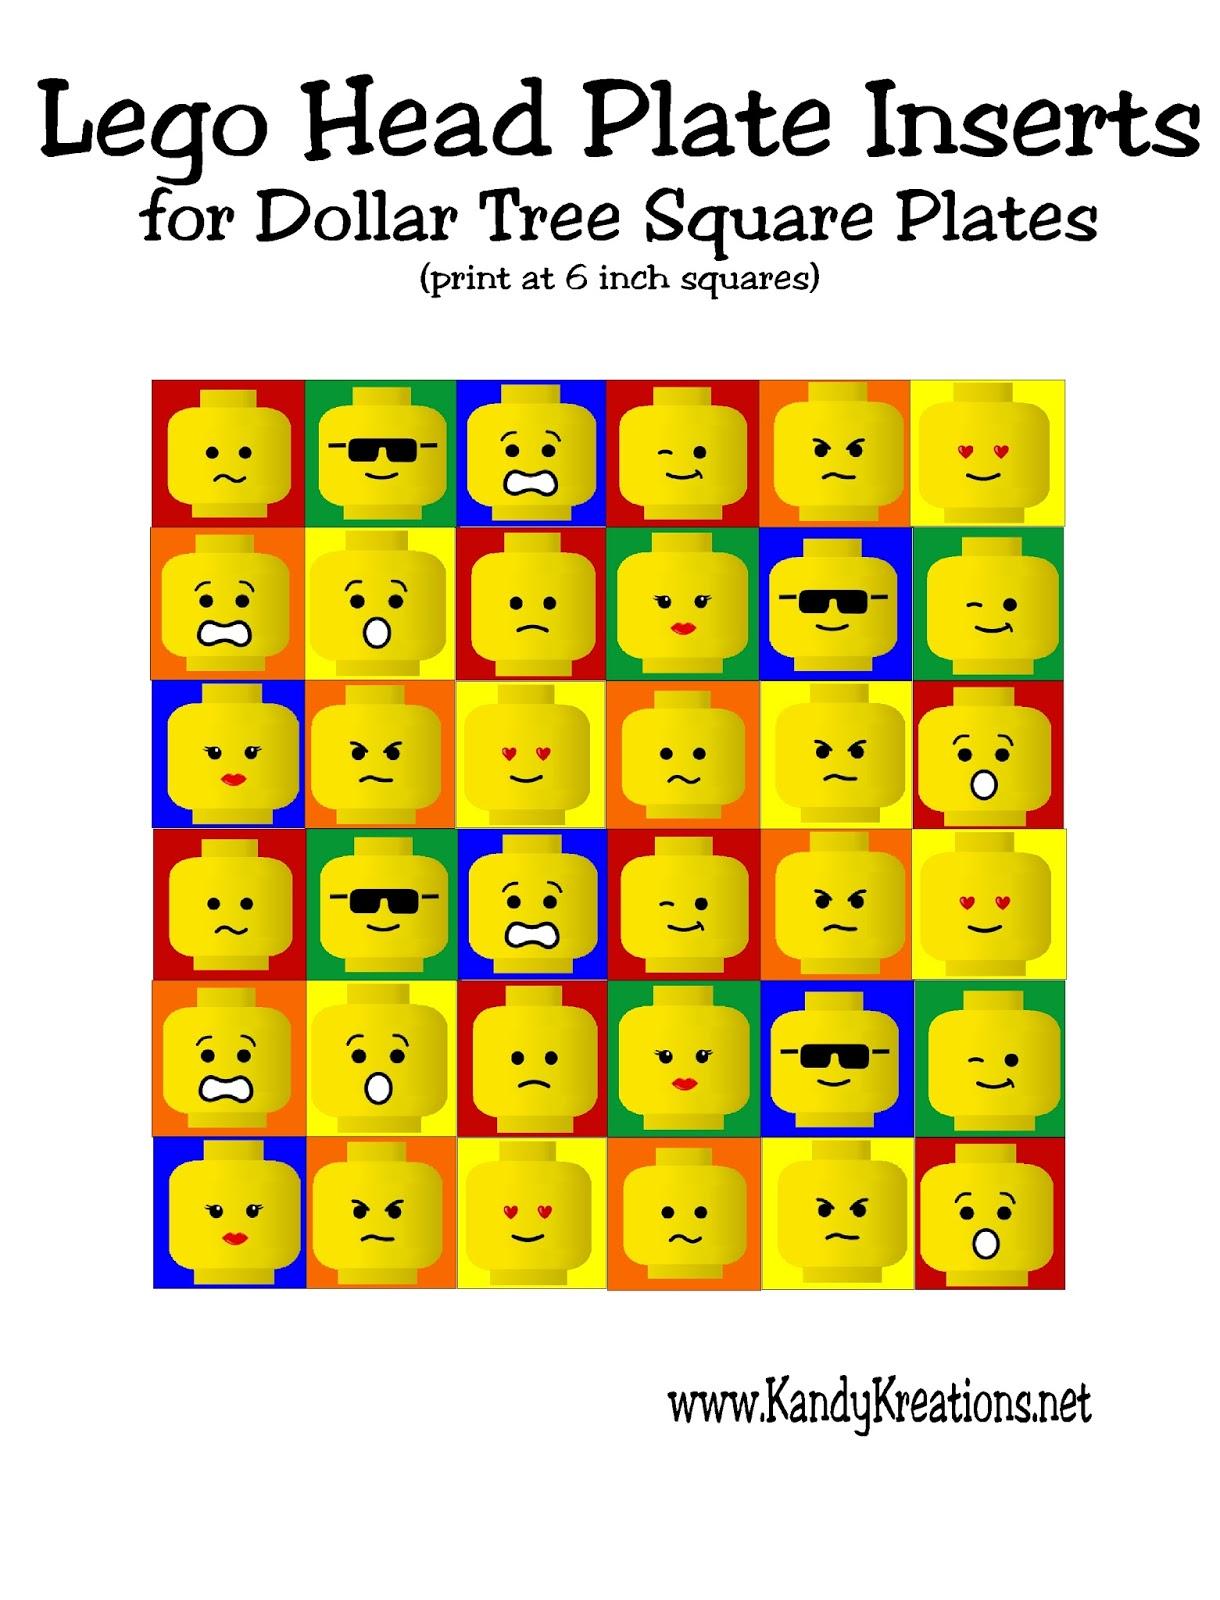 Lego Ninjago Wall Stickers Search Results For Lego Template Printable Calendar 2015